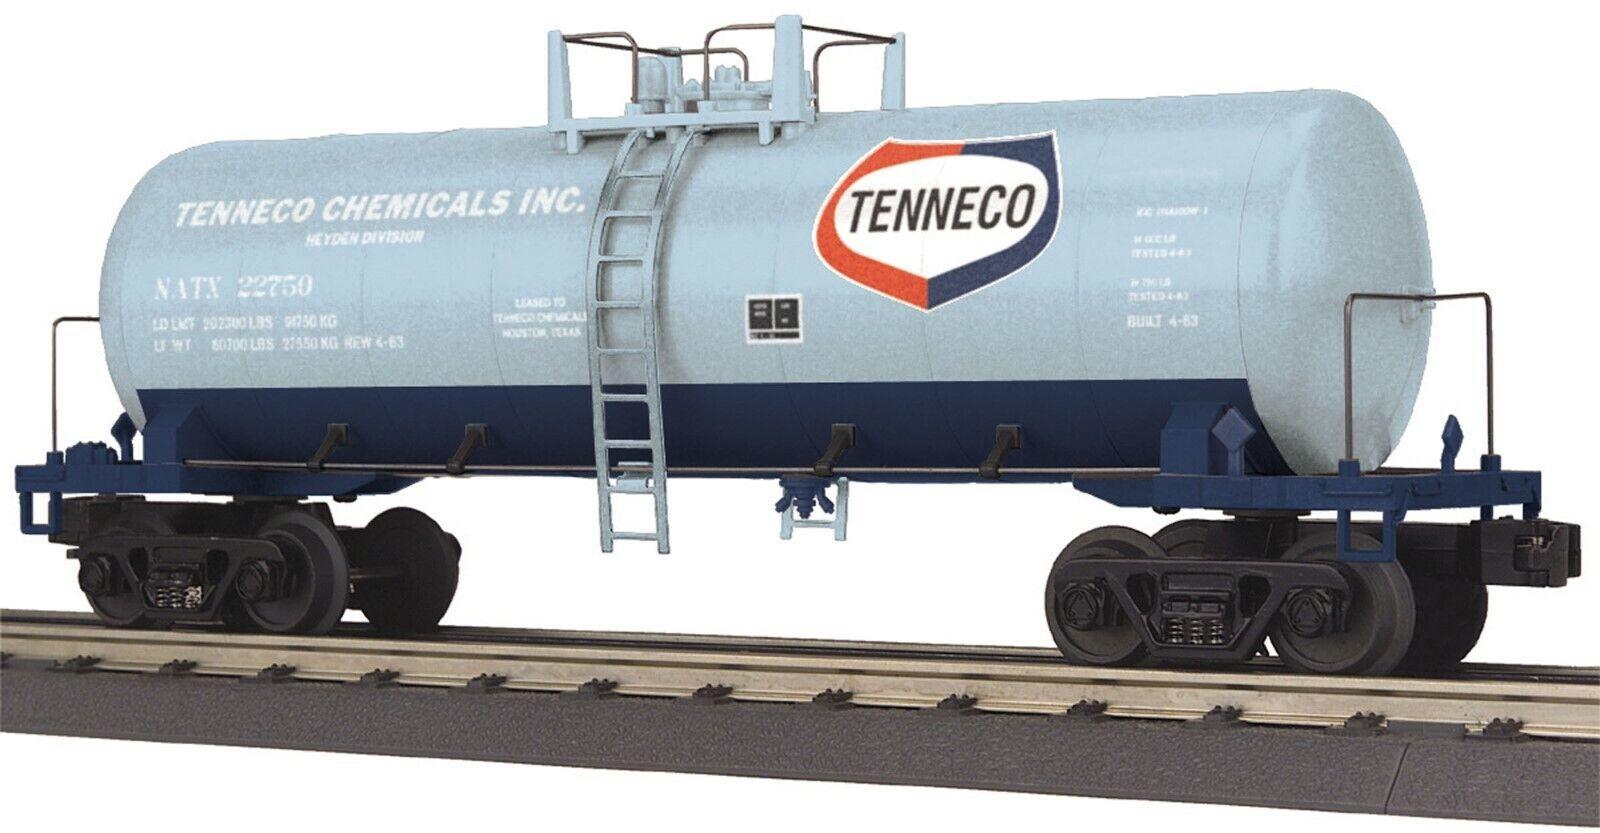 NIB RAILKING 30-73398 O Gauge RailKing Modern Tank Car Tenneco